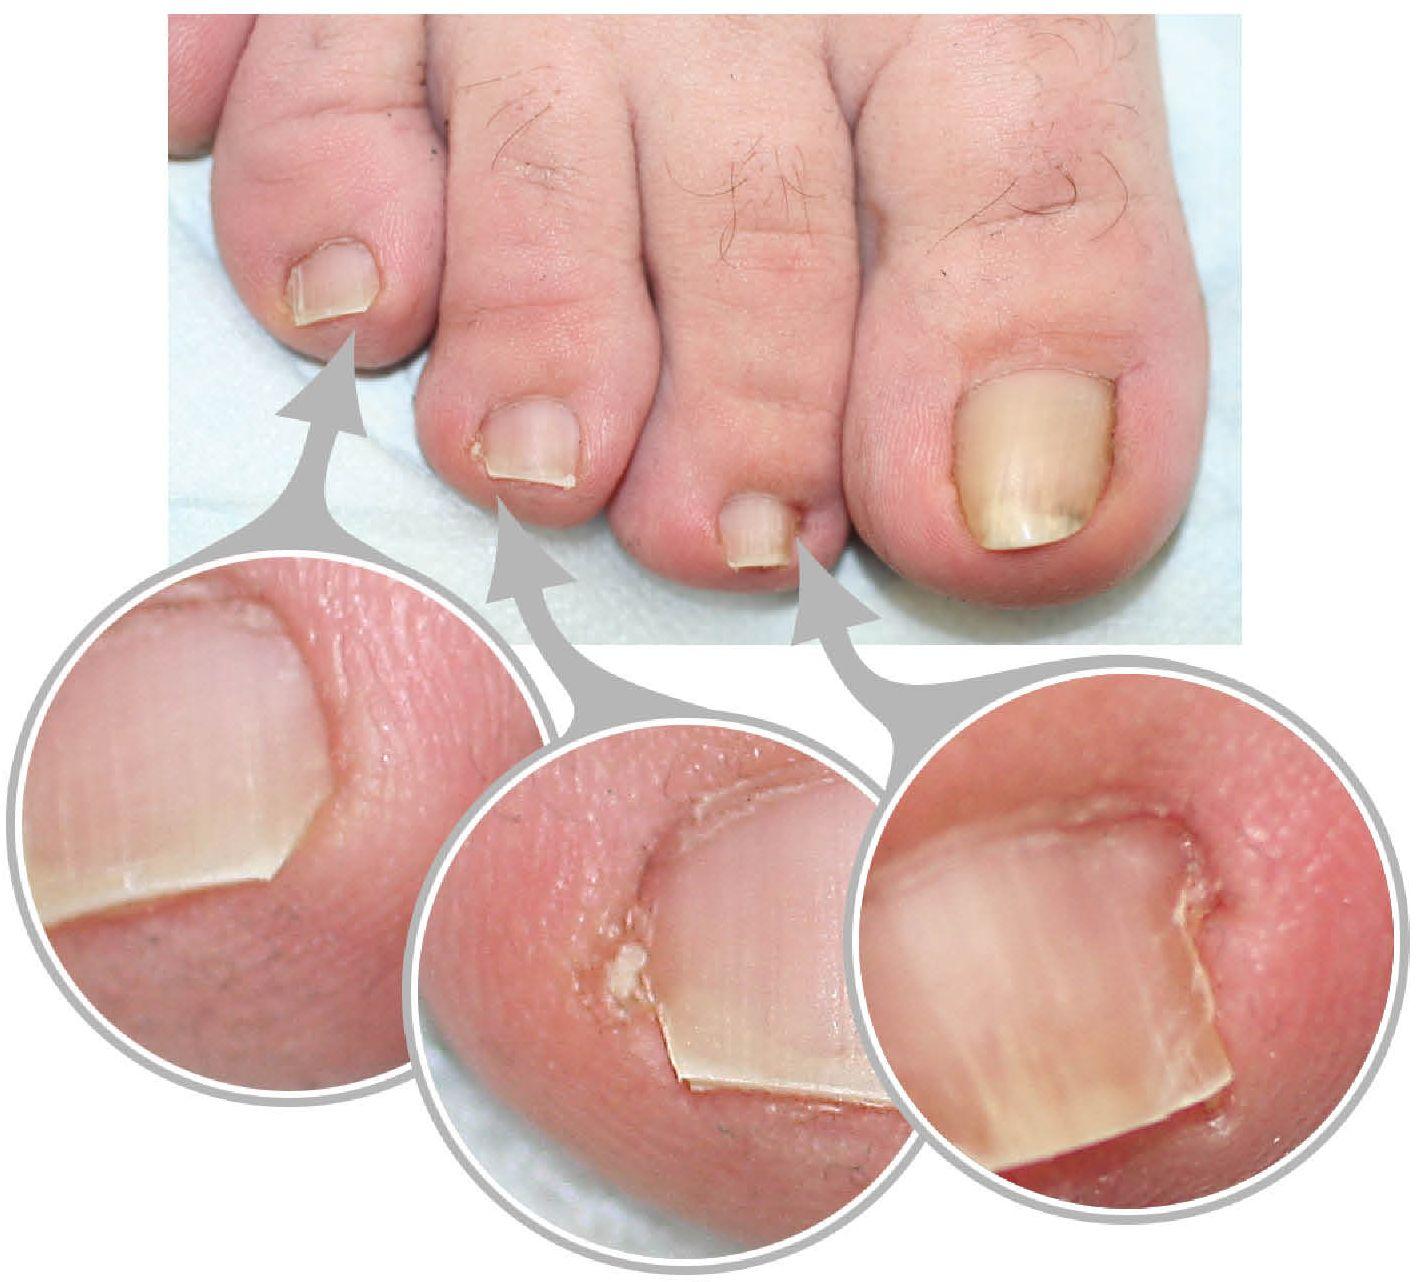 Болит палец на ноге возле ногтя